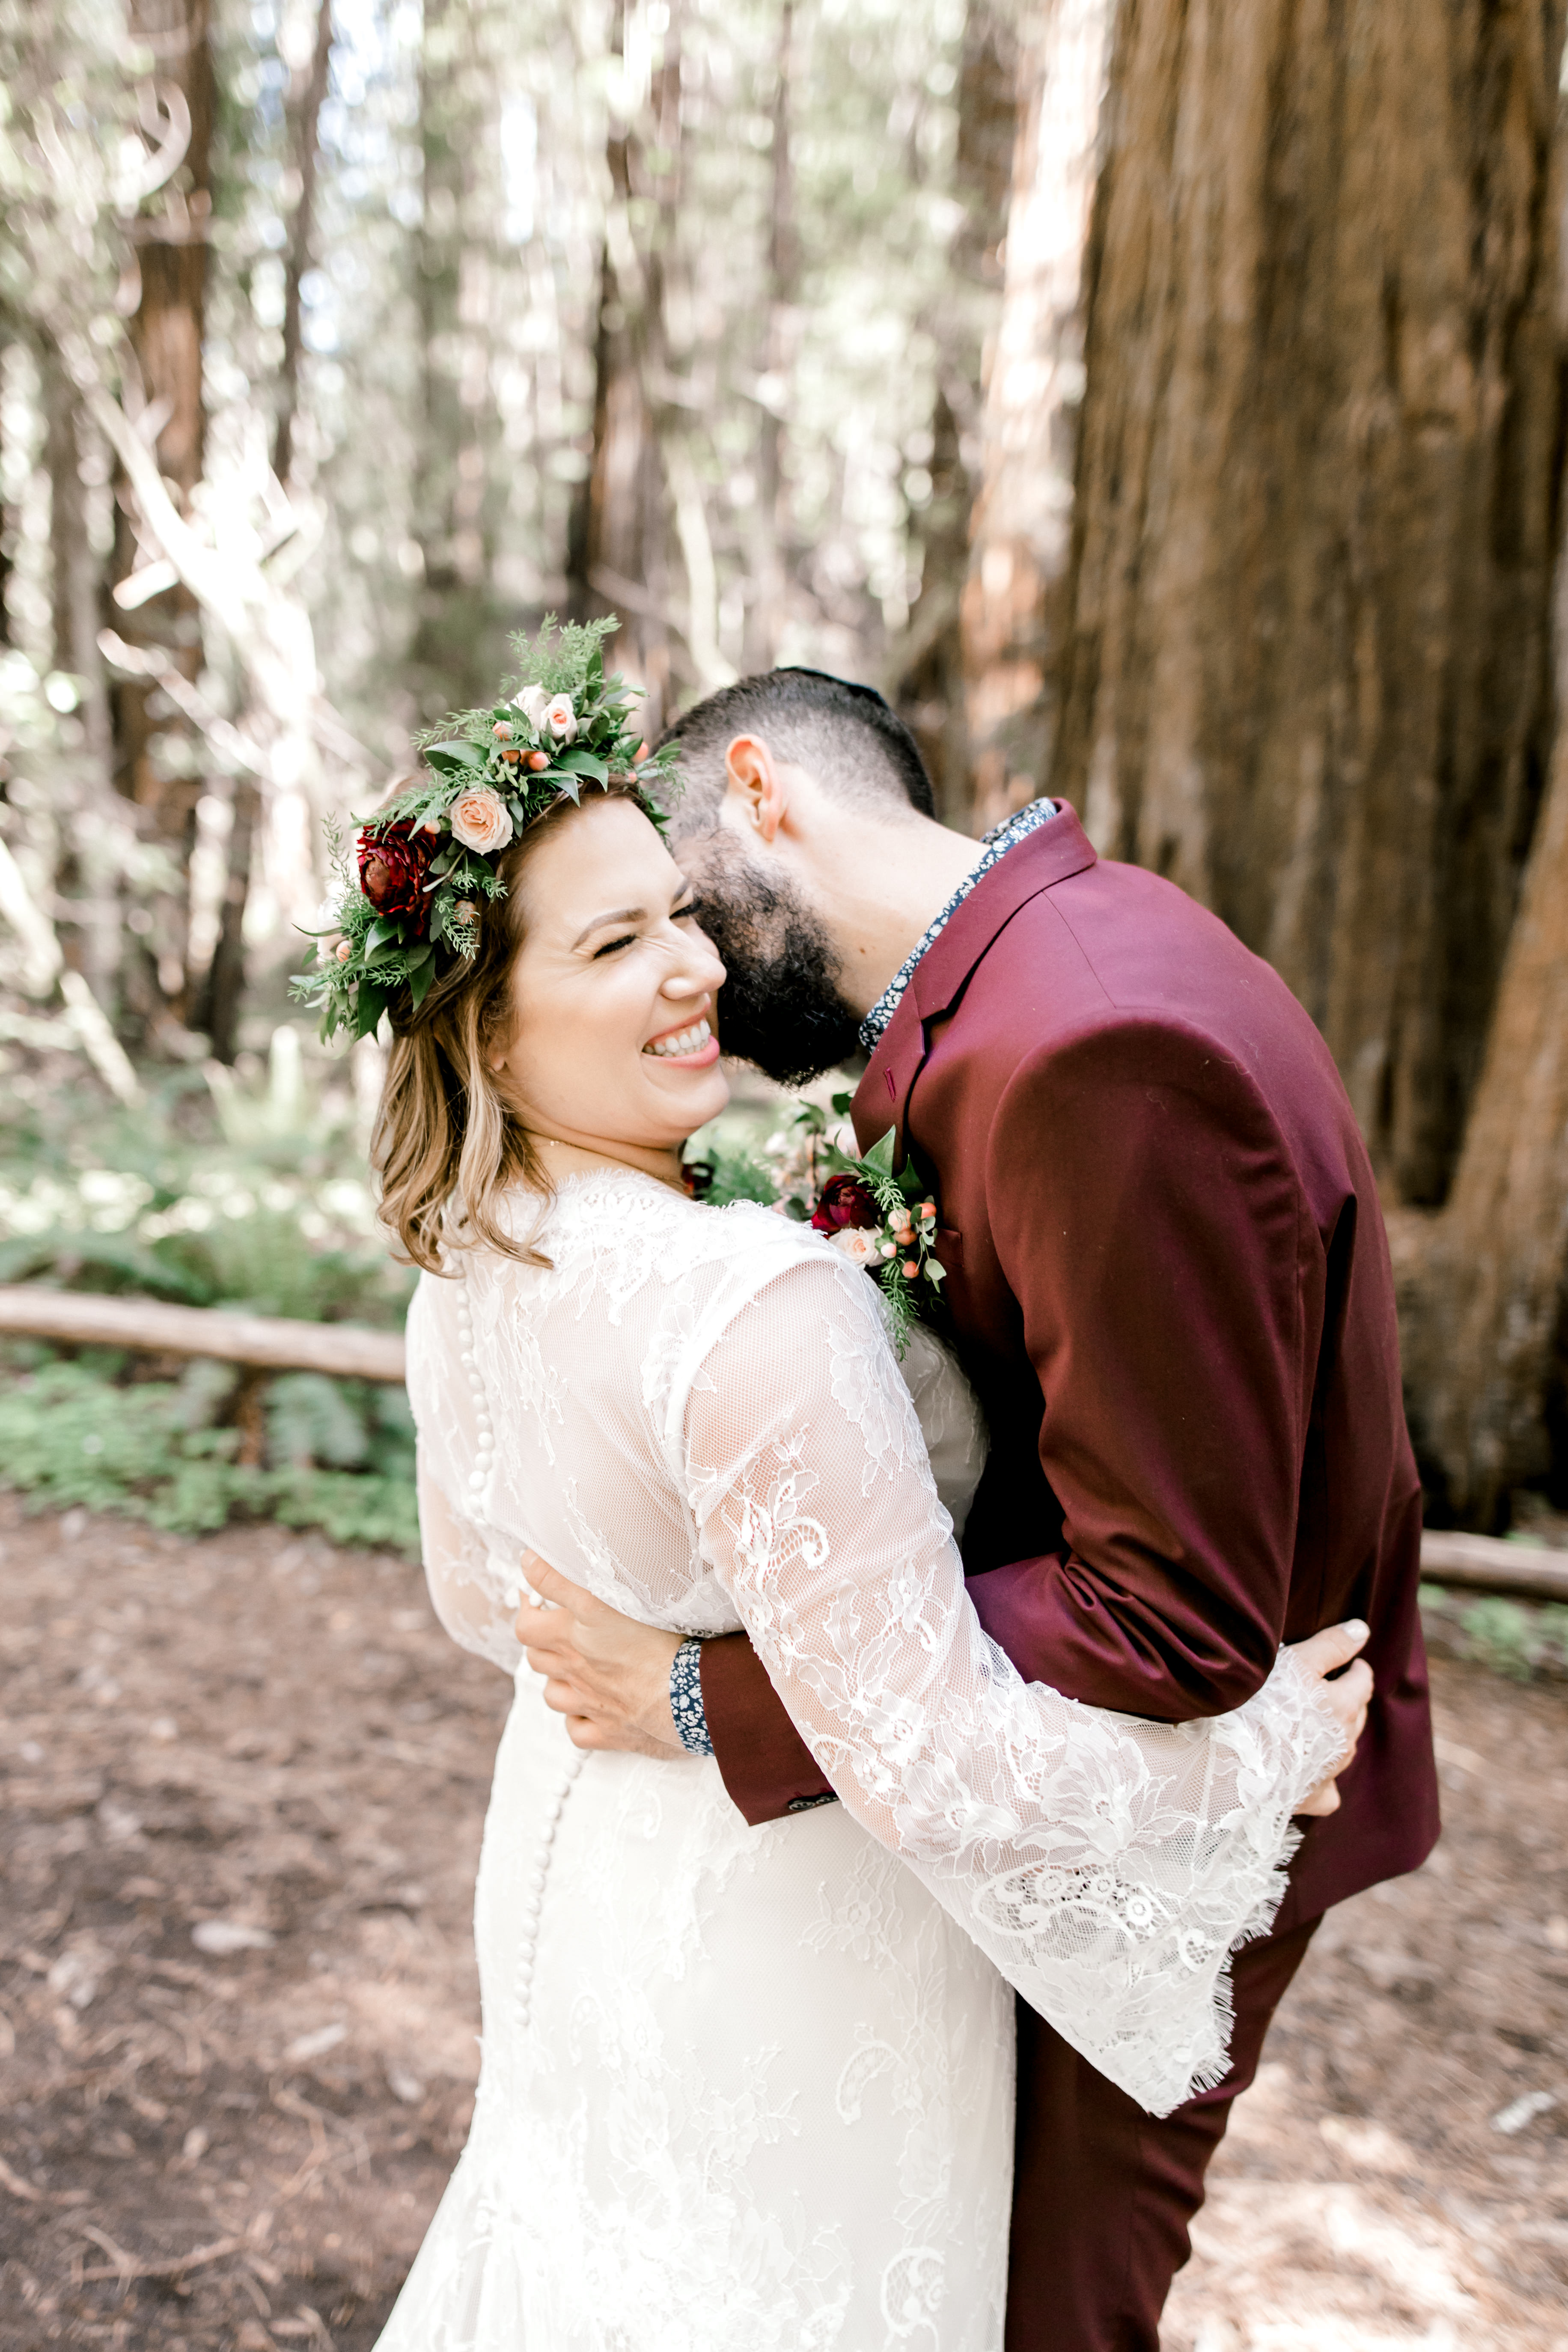 Natalia and Adam Wedding - 4.21.18 - Sam Areman Photo 159588_